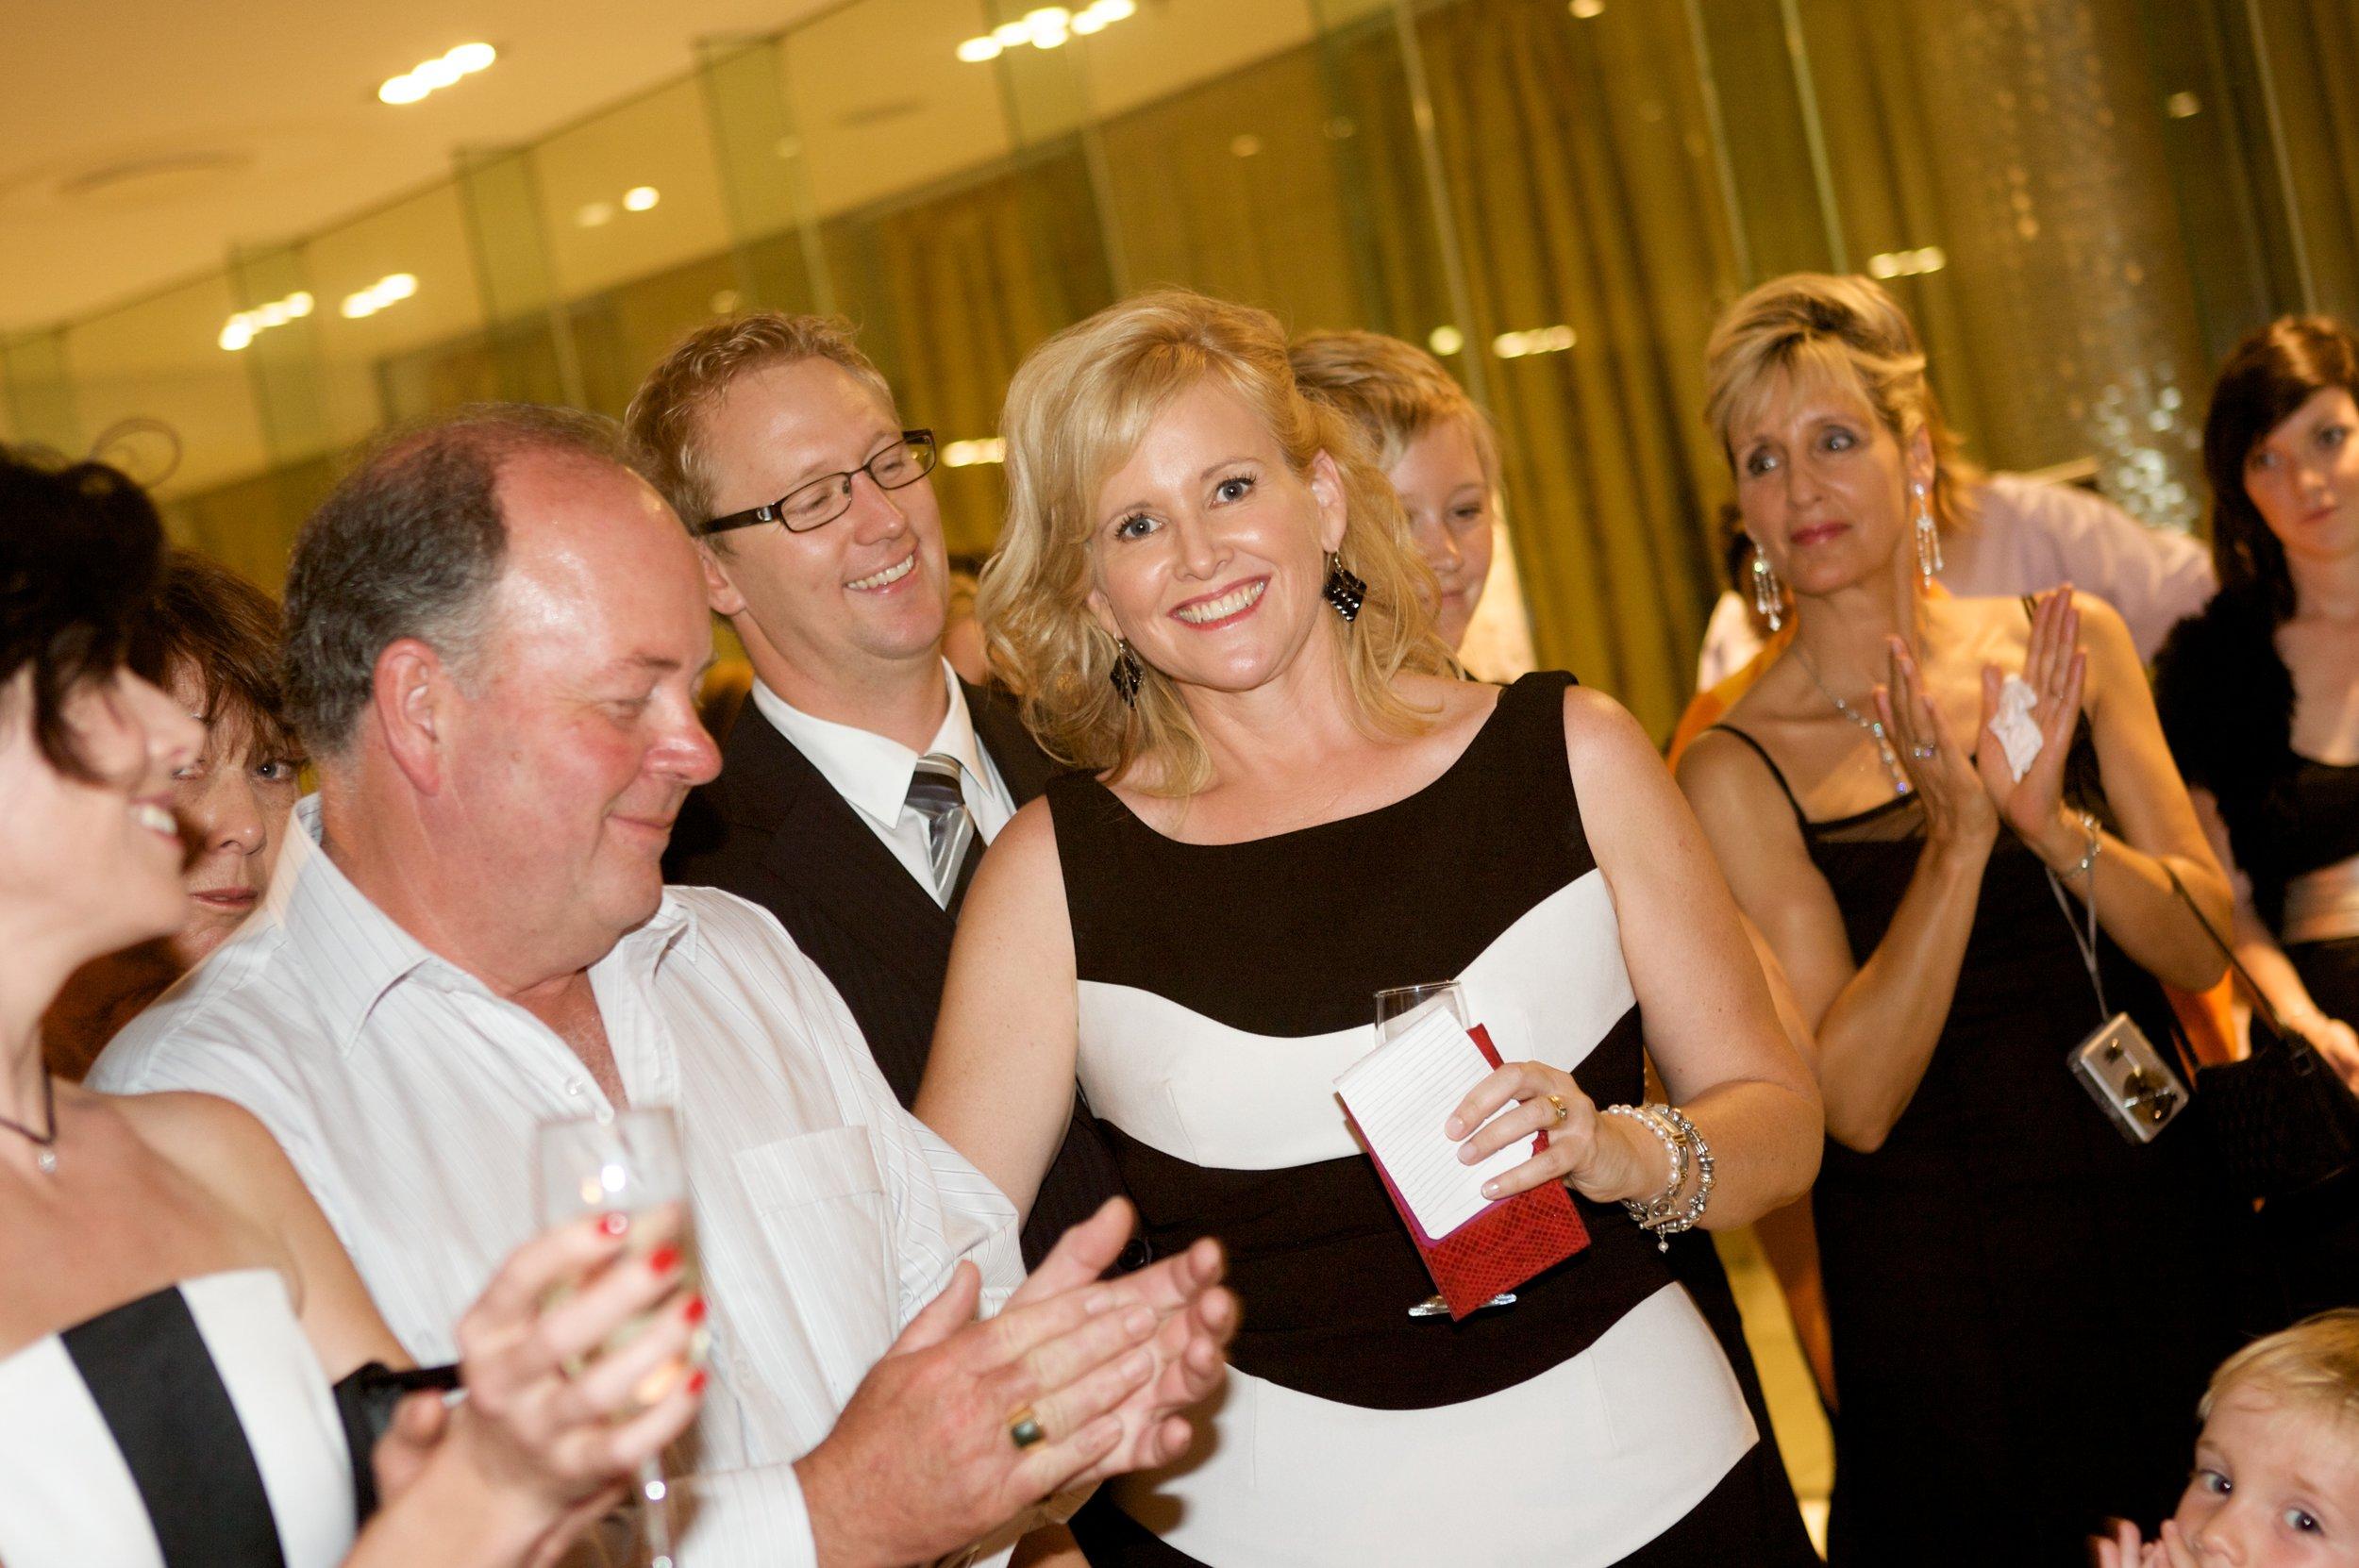 Private Party Sunshine Coast, Toowoomba and Brisbane